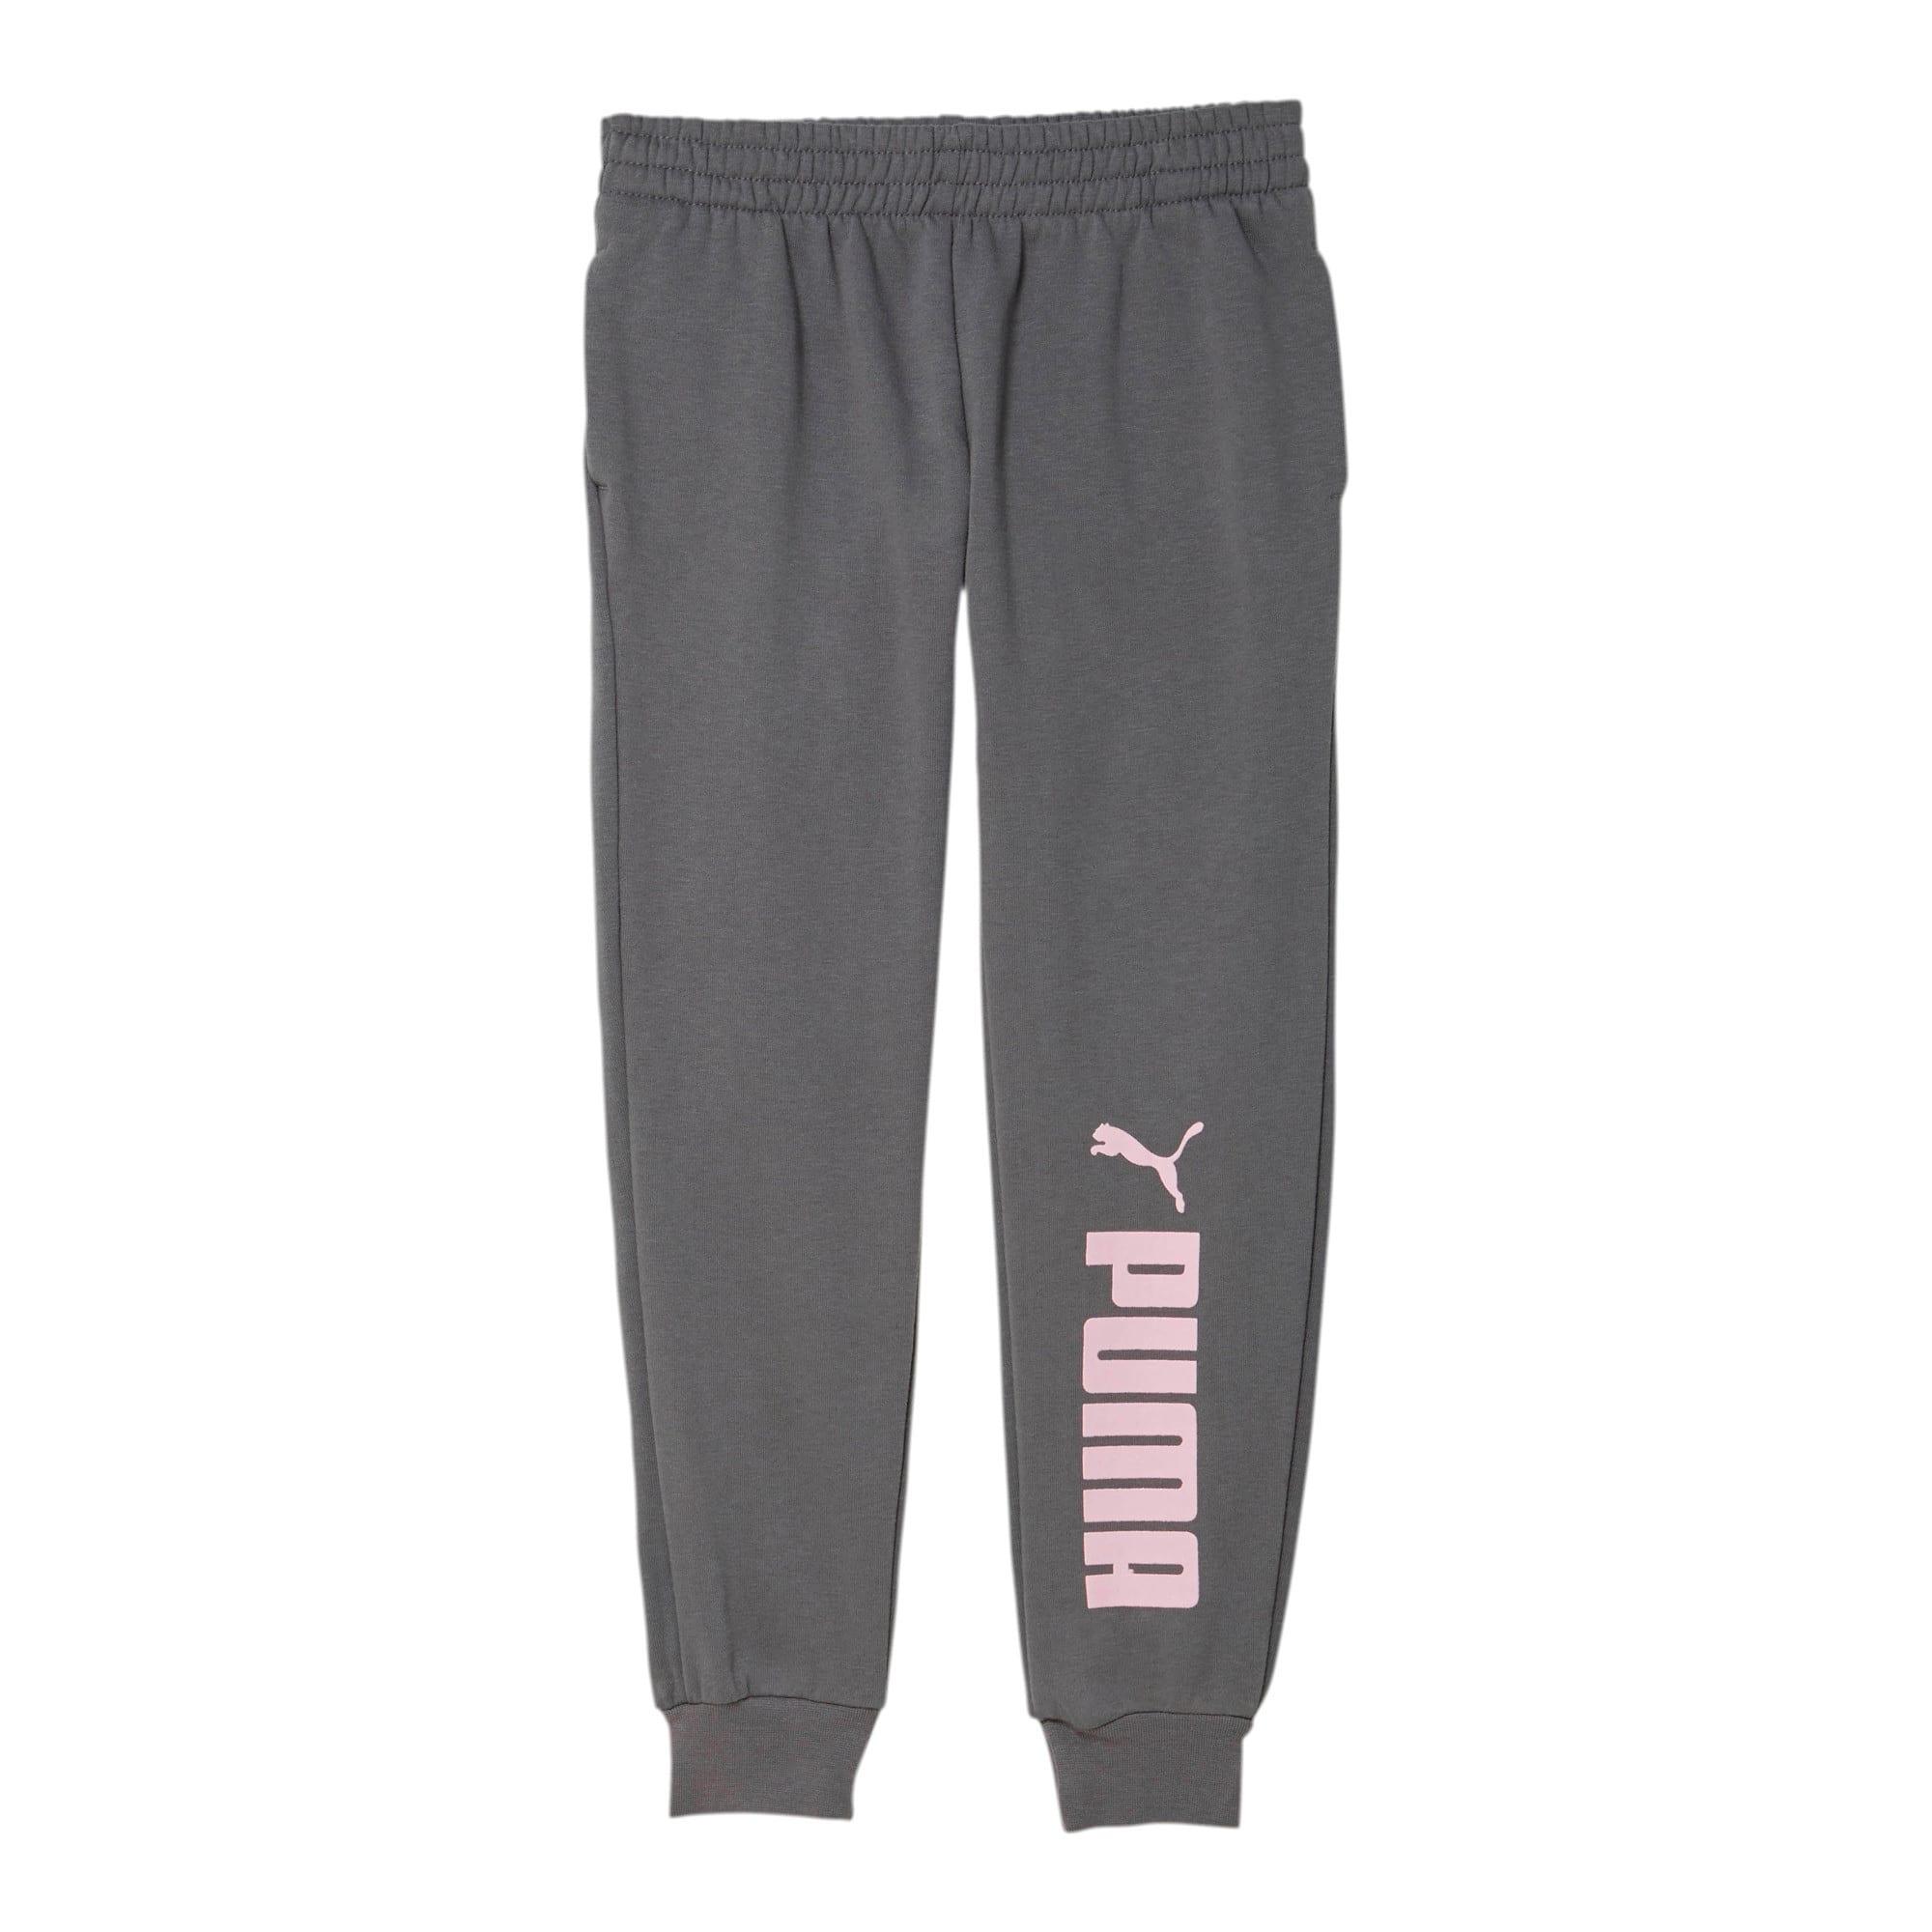 Miniatura 1 de Pantalones de polar con logo N° 1 Pack JR para niñas, CASTLE ROCK, mediano